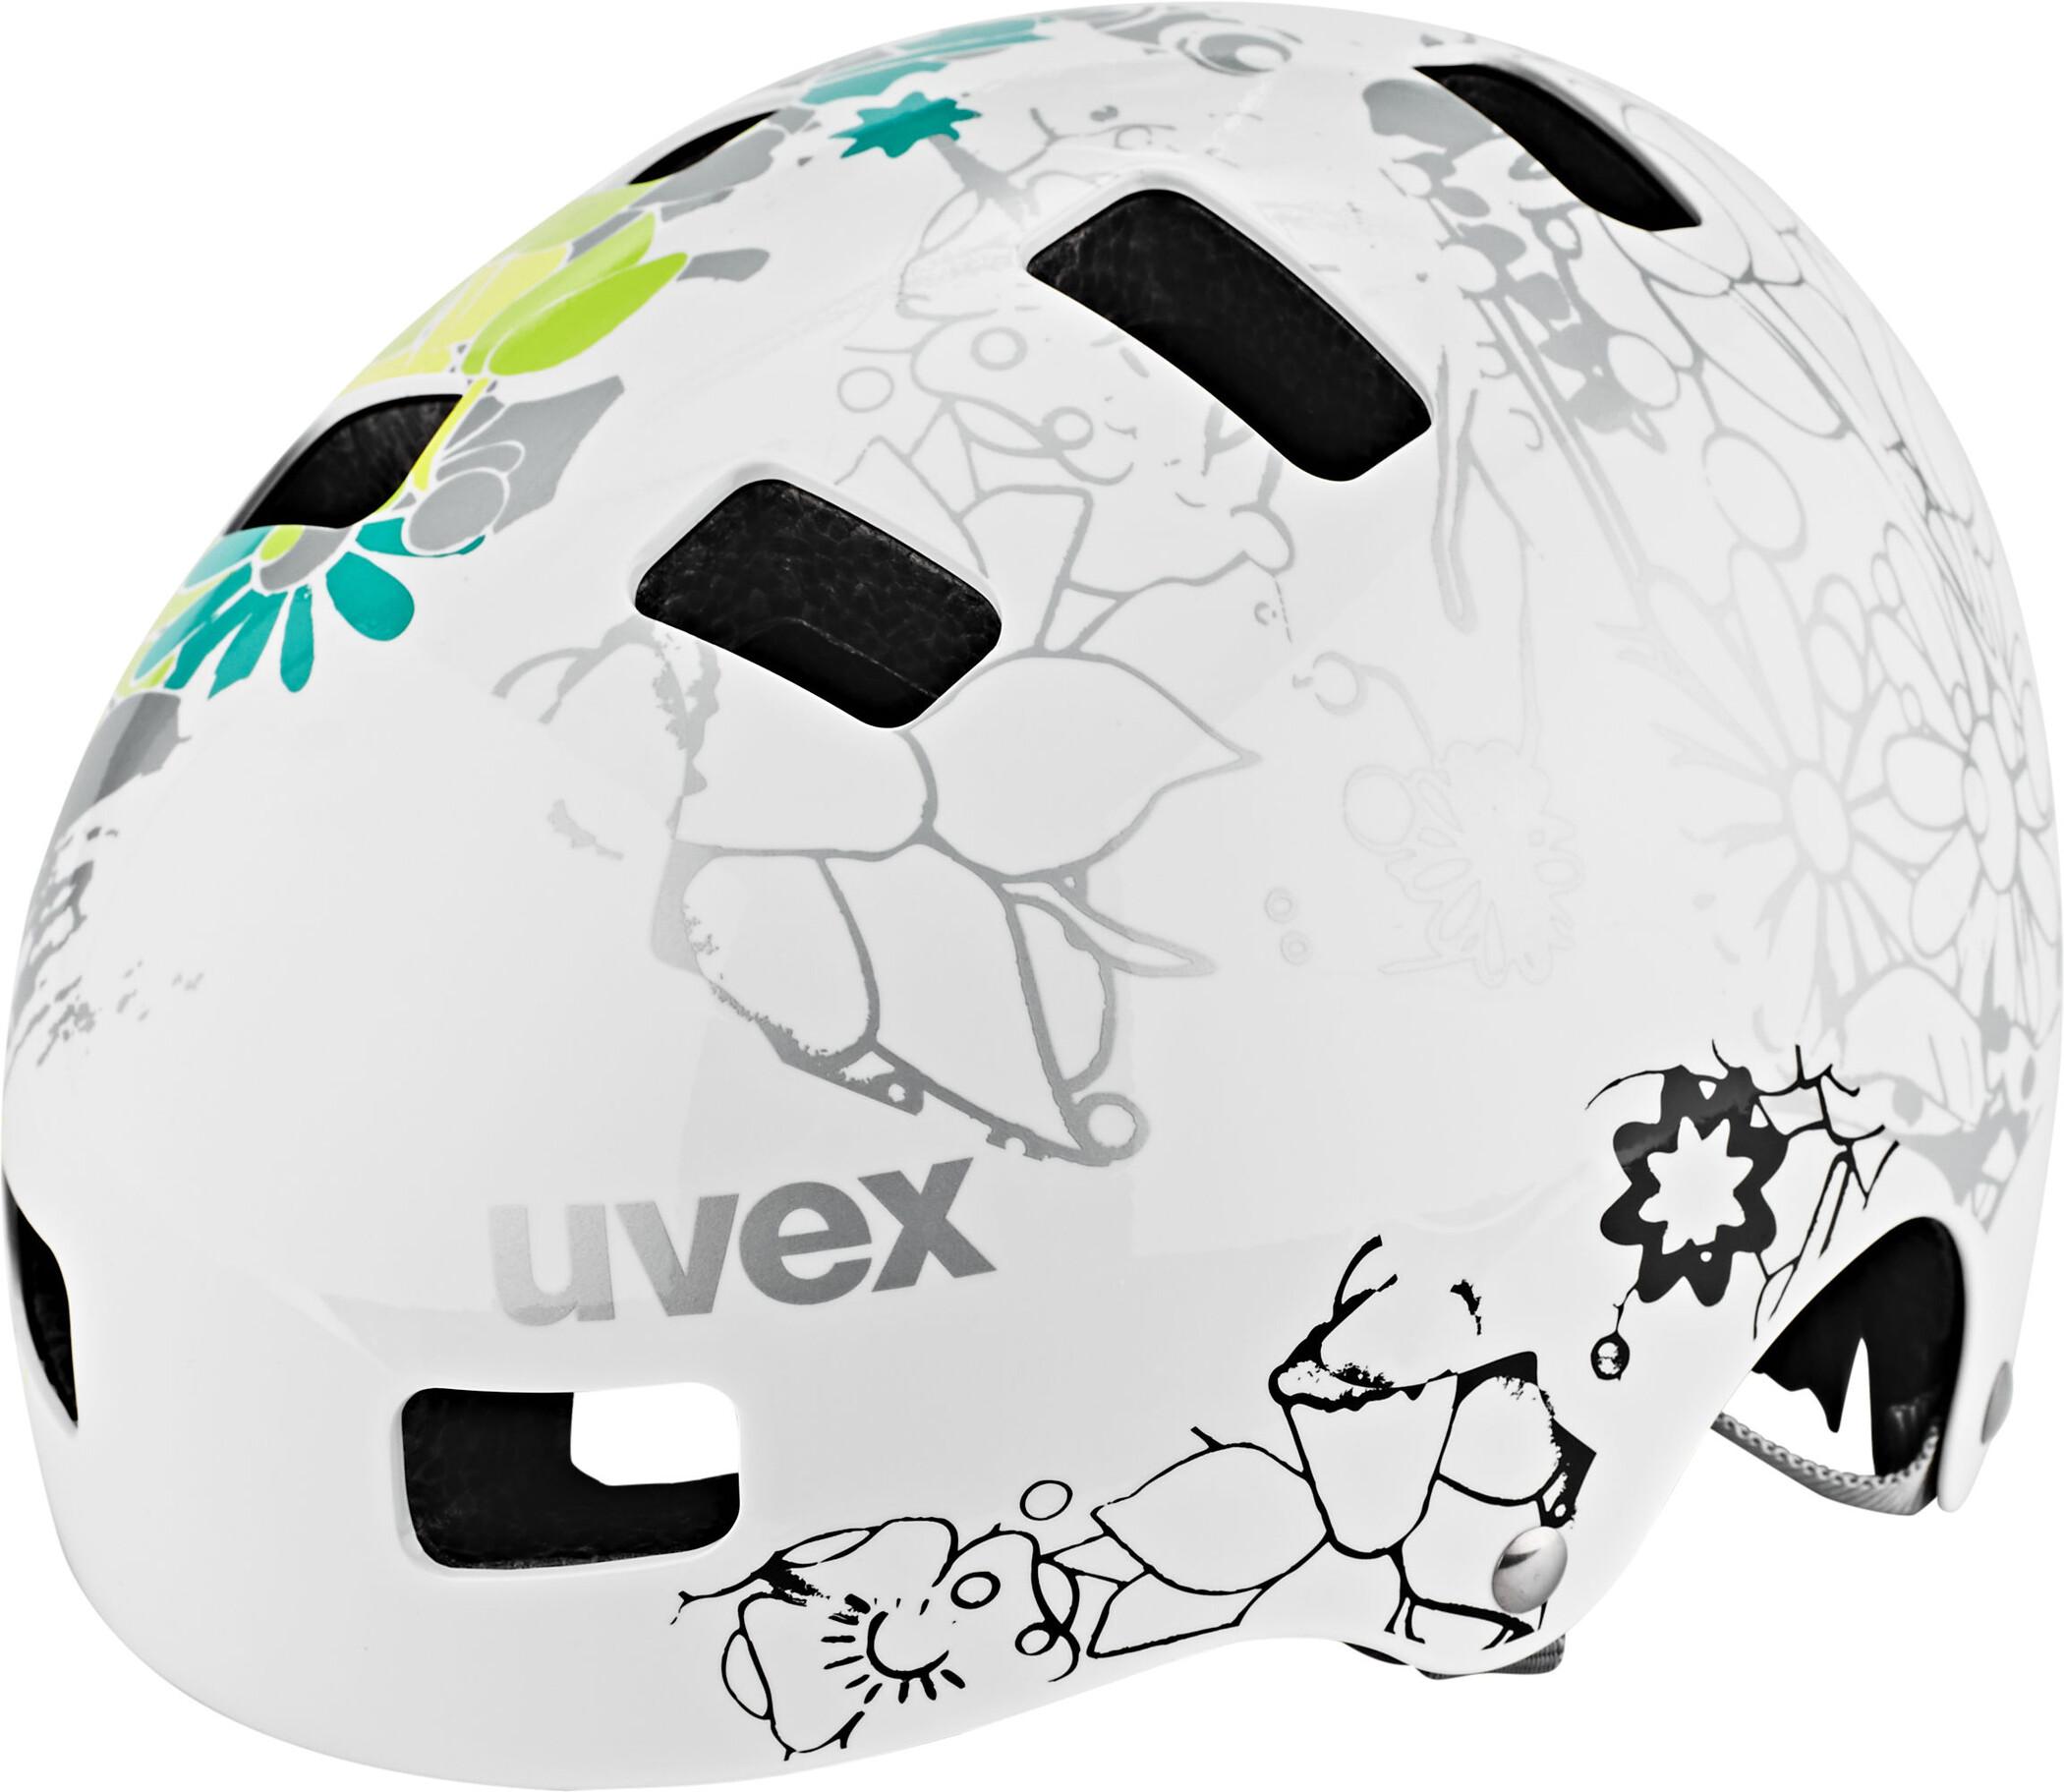 Uvex kid 3 Kids Helmet - blackout blue | Helmets